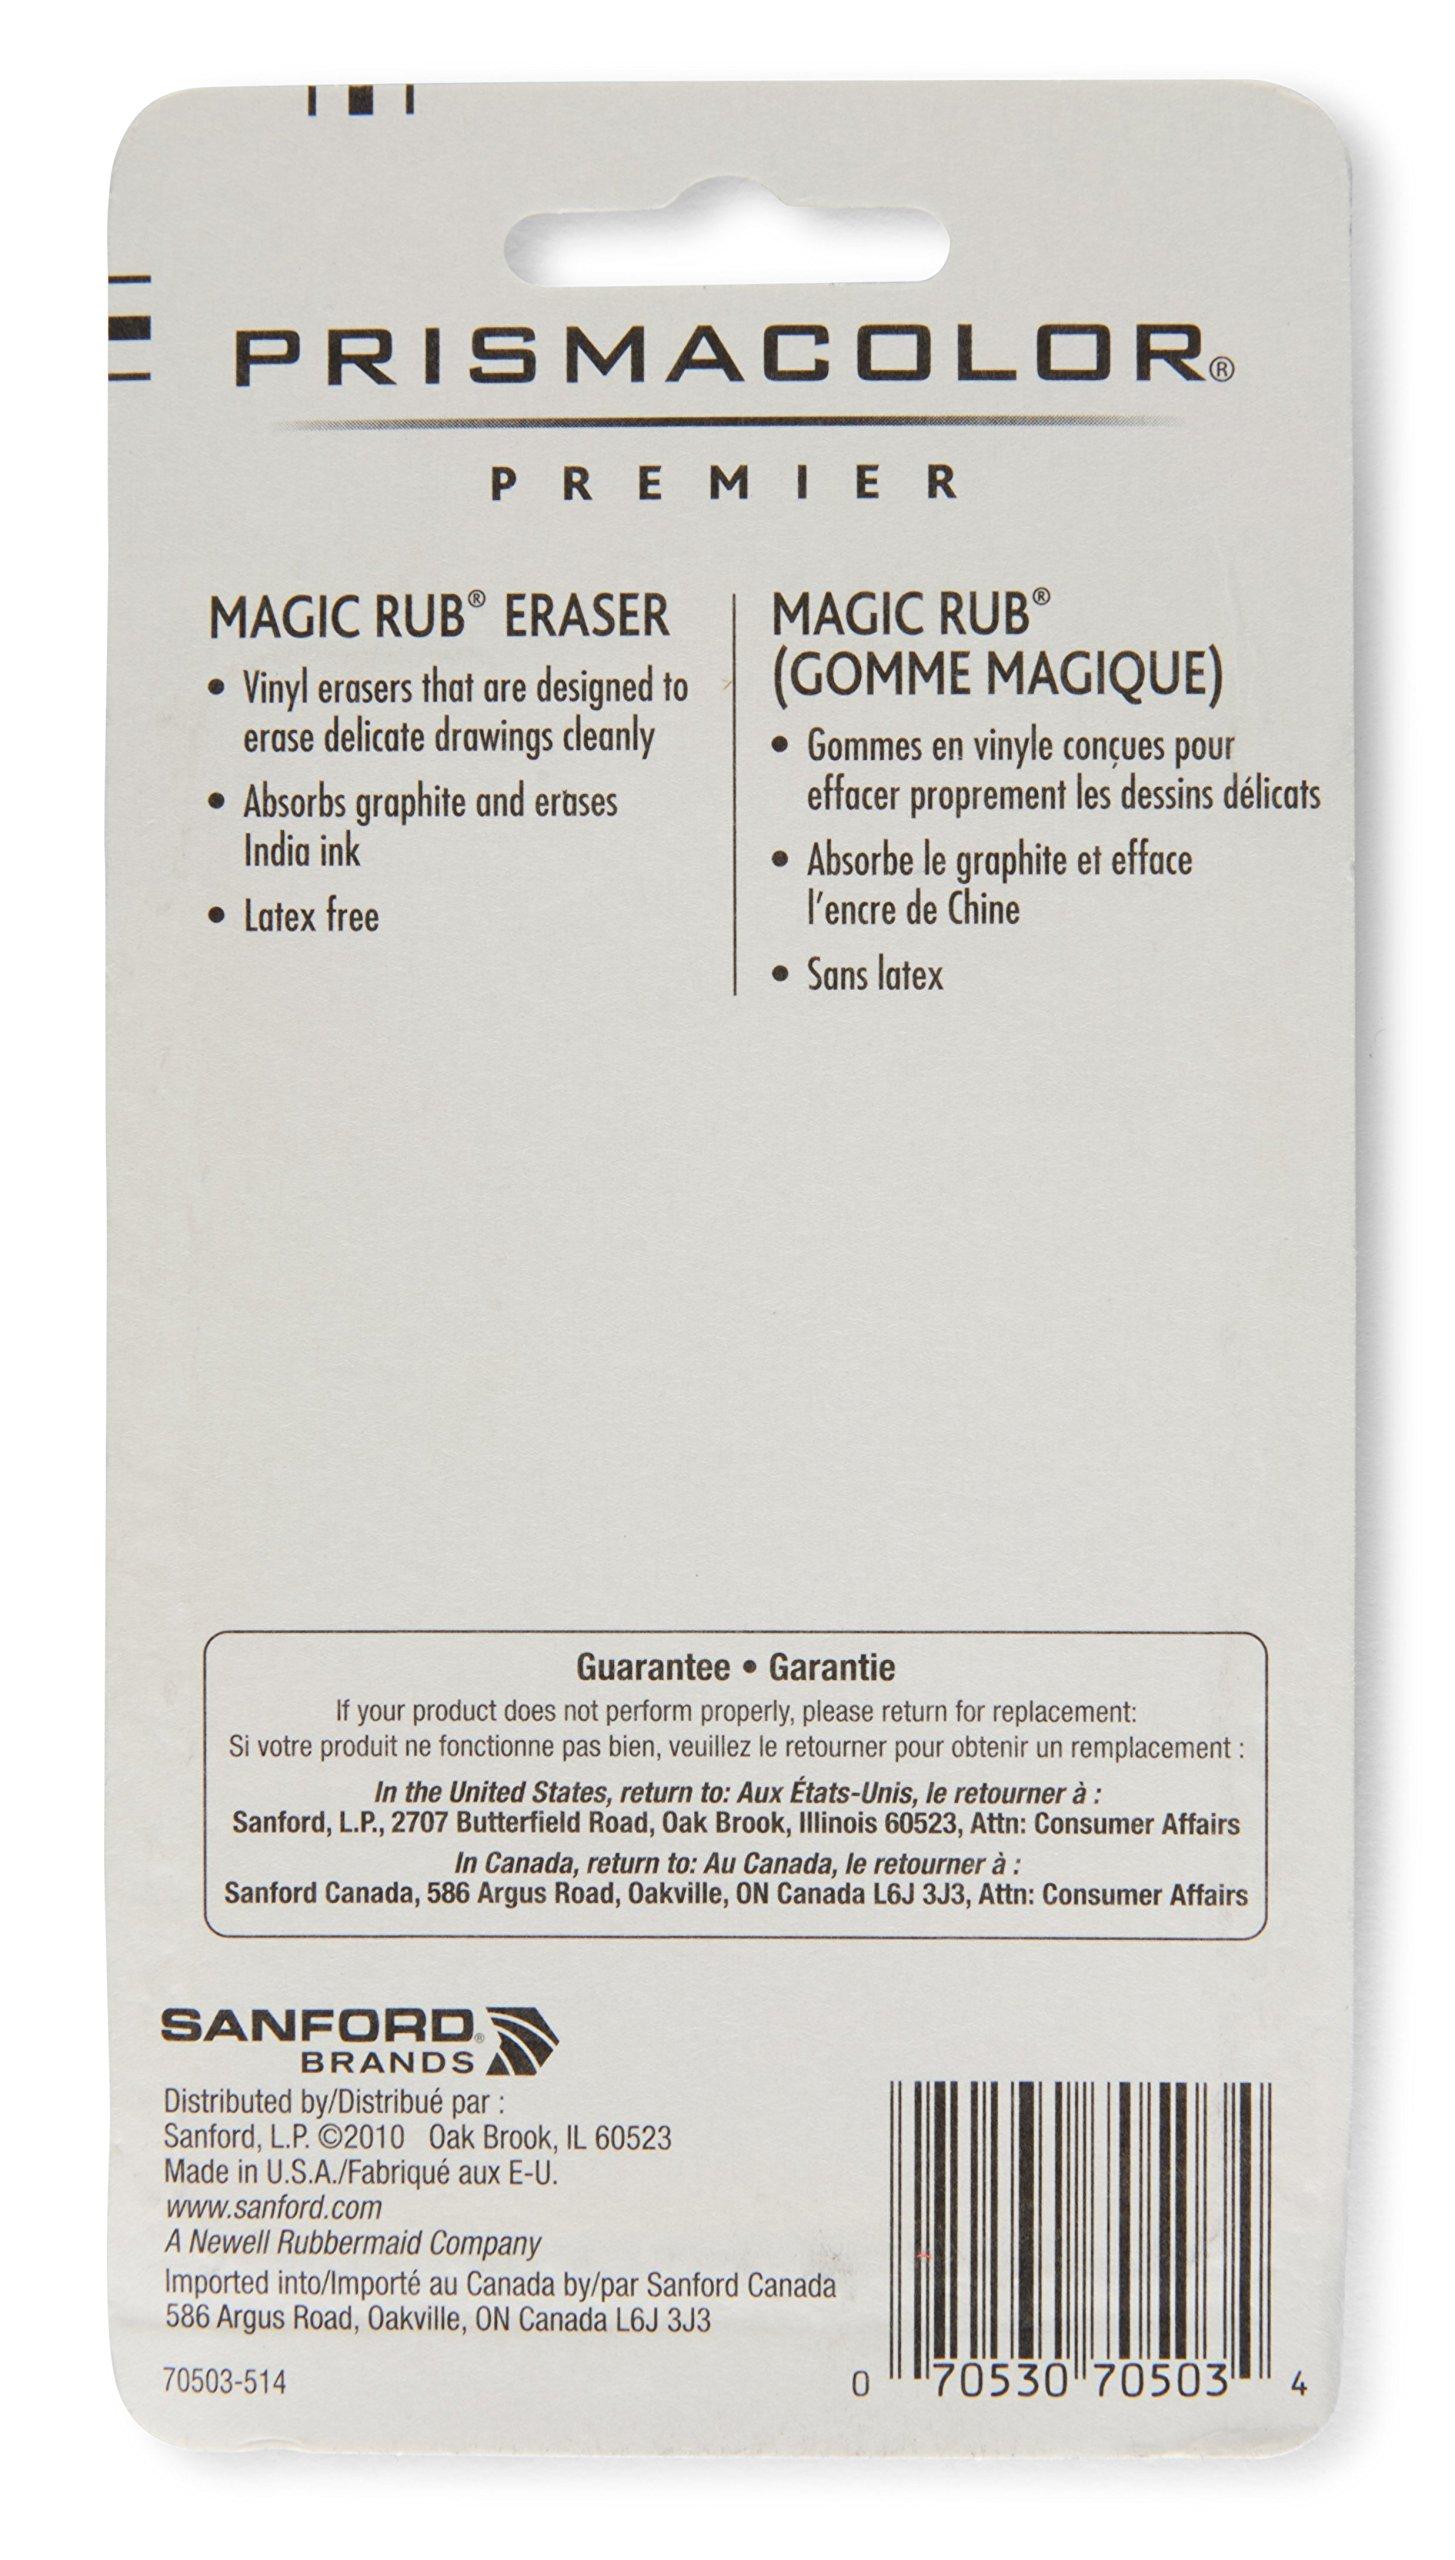 Prismacolor Premier Magic Rub Vinyl Erasers, 3-Count by Prismacolor (Image #2)